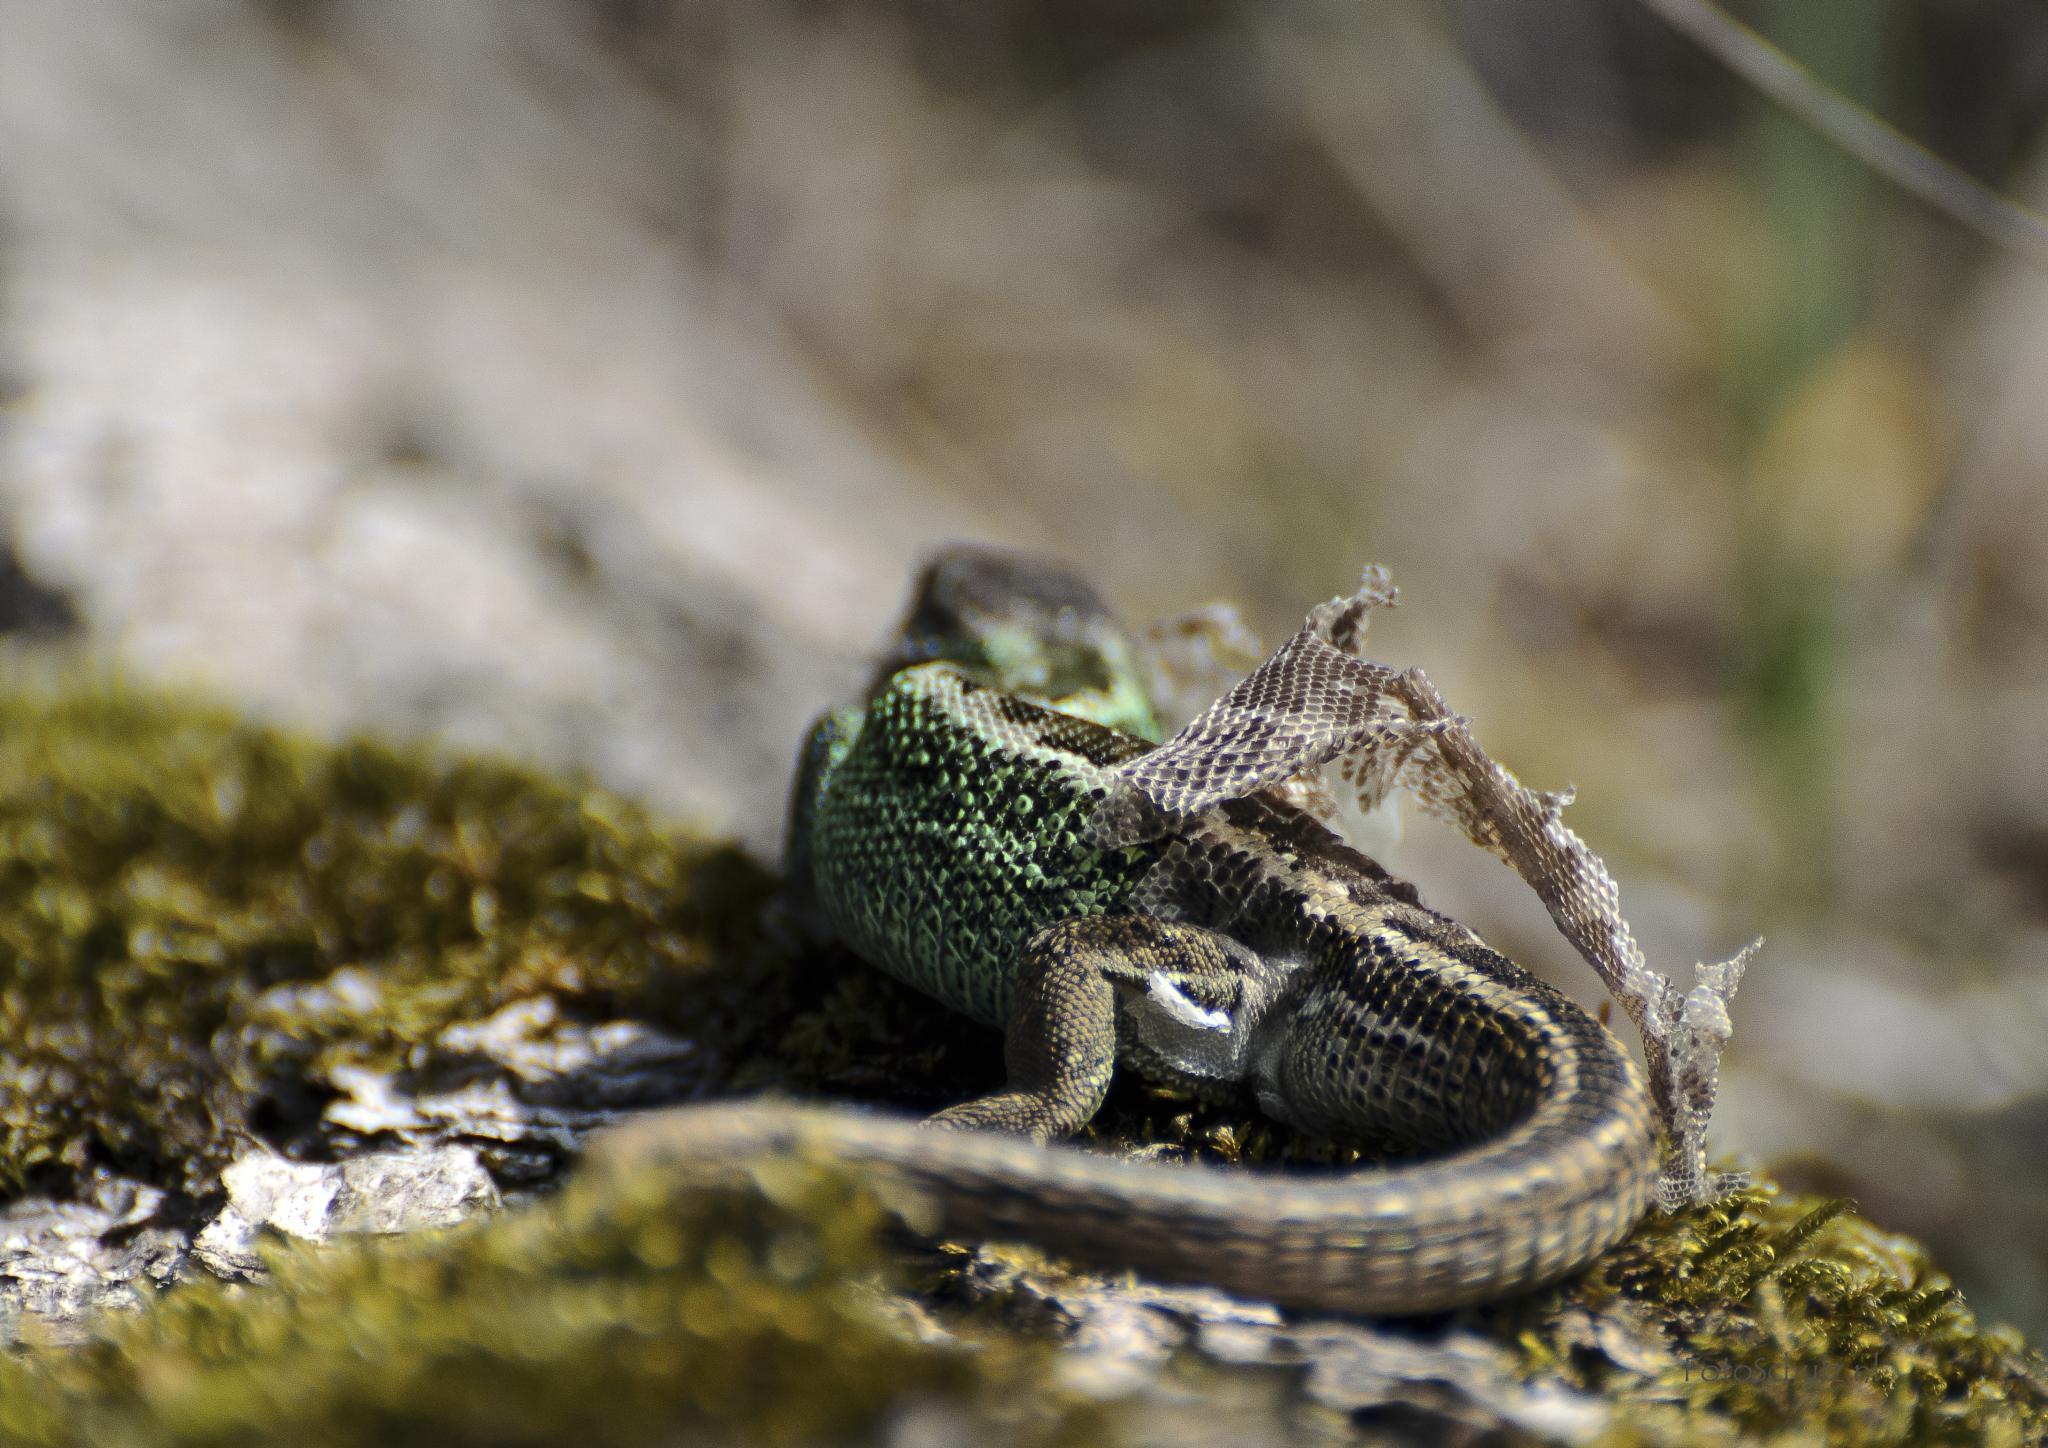 Green Salamander by helga.schulz.92